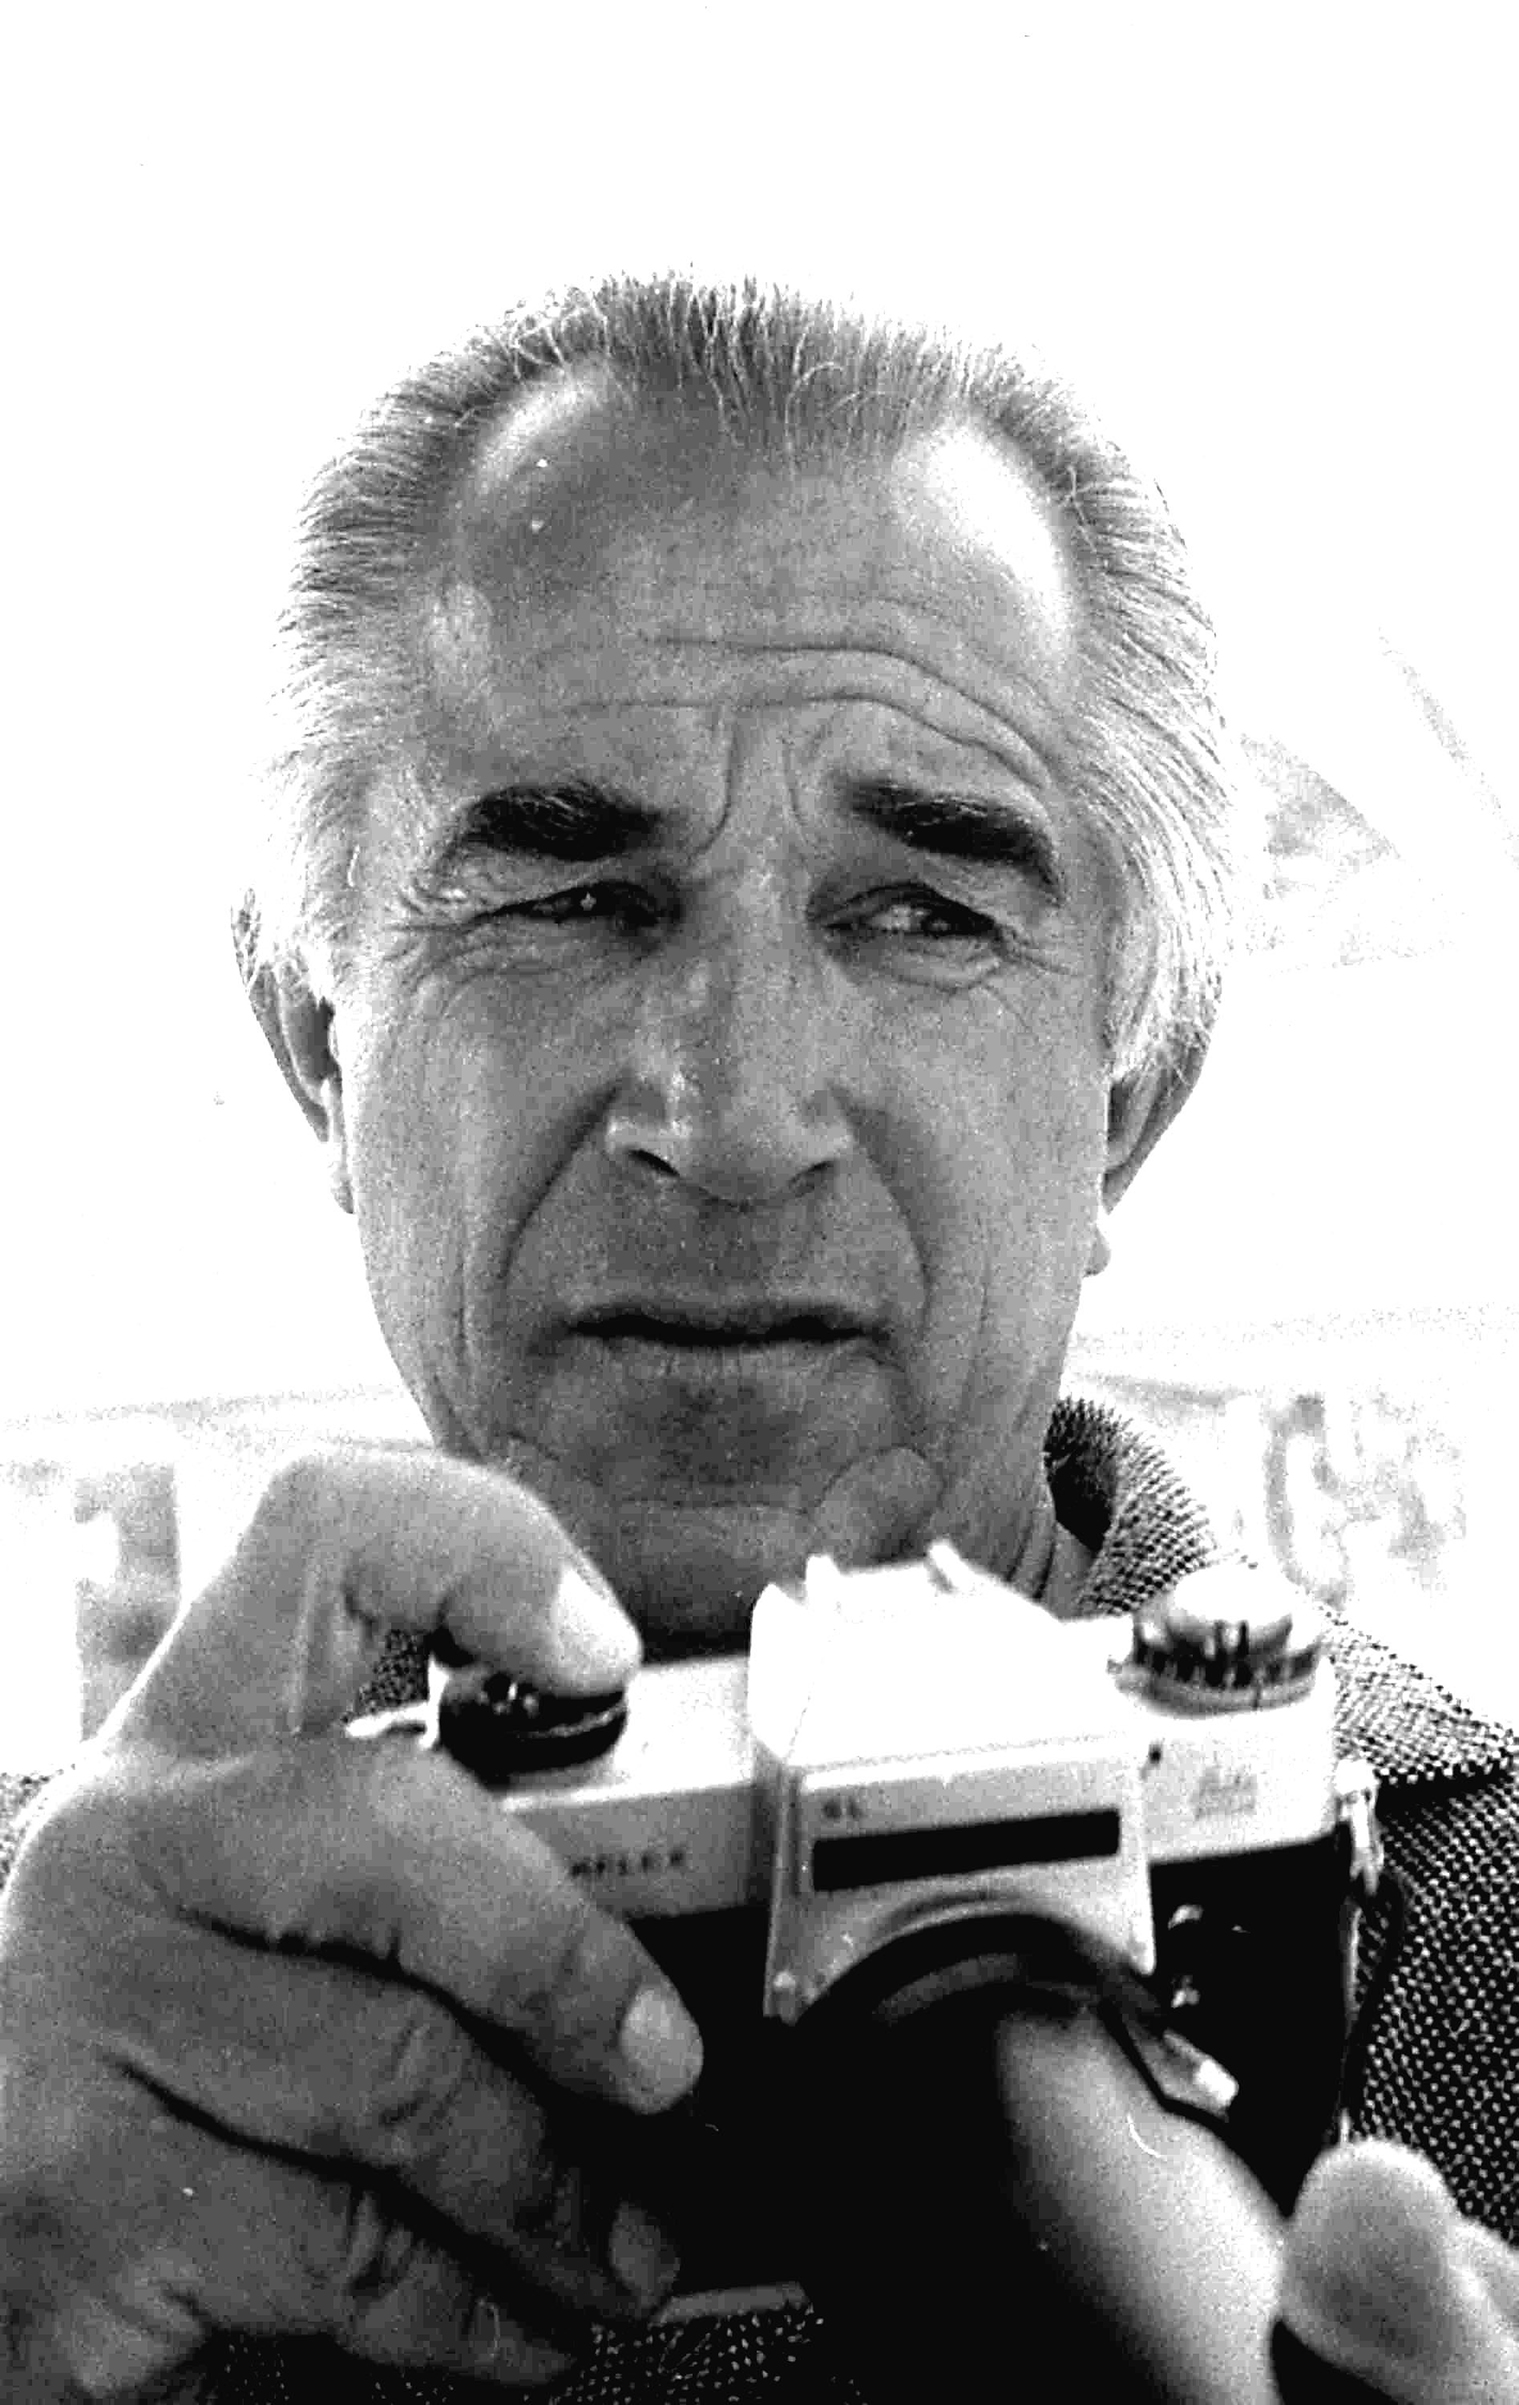 Headshot portrait of American photographer David Douglas Duncan as he holds a camera, Miami, Florida, April 1969.